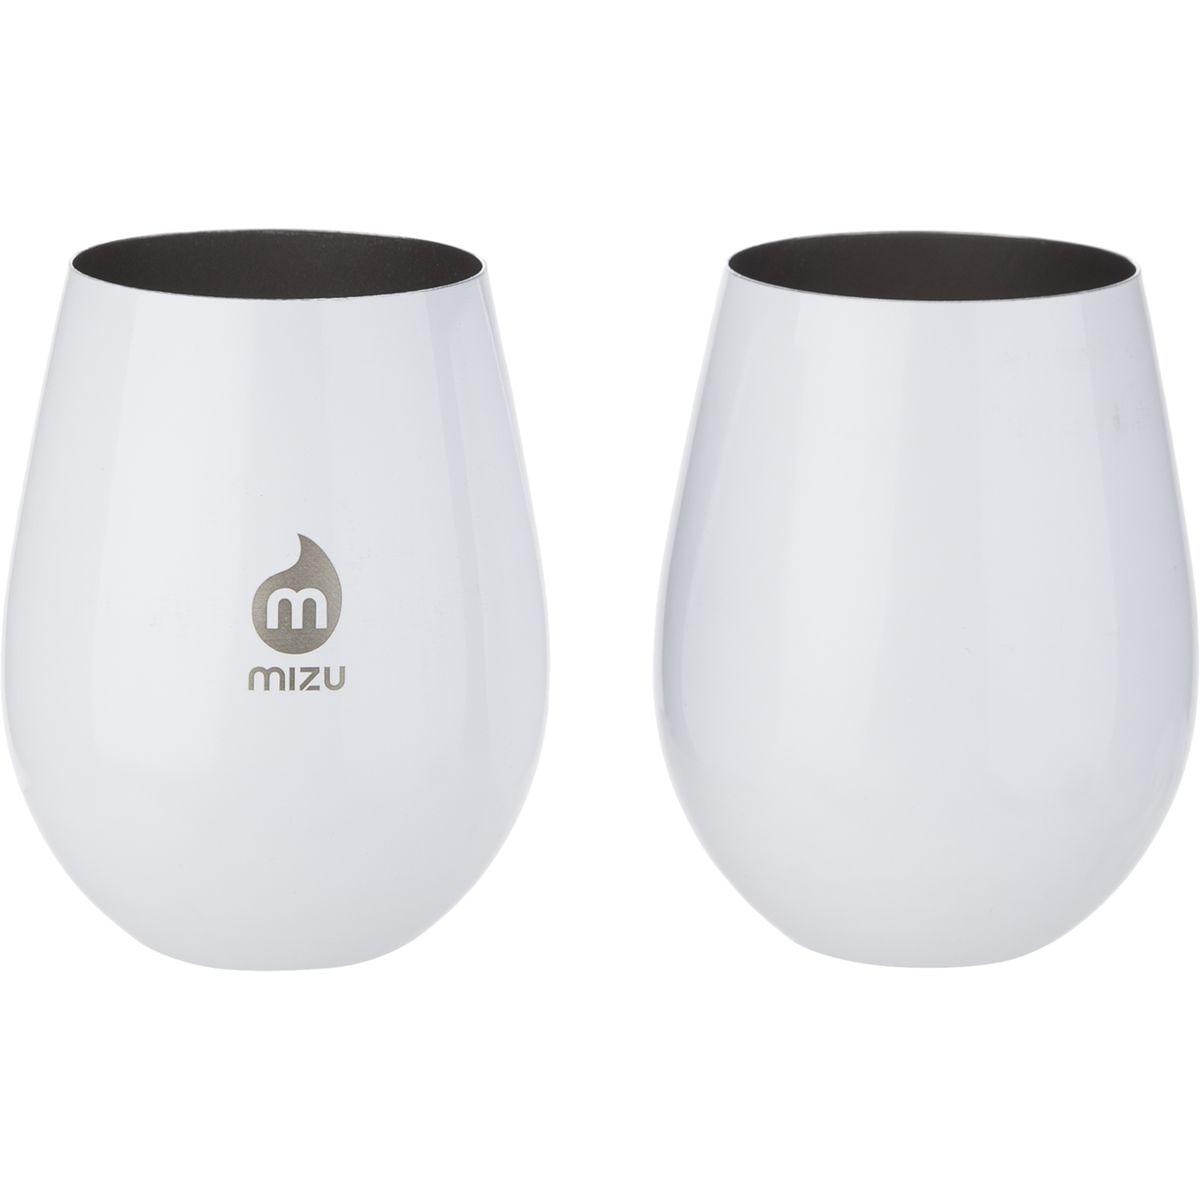 MIZU Wine Cup Set Glossy White, One Size